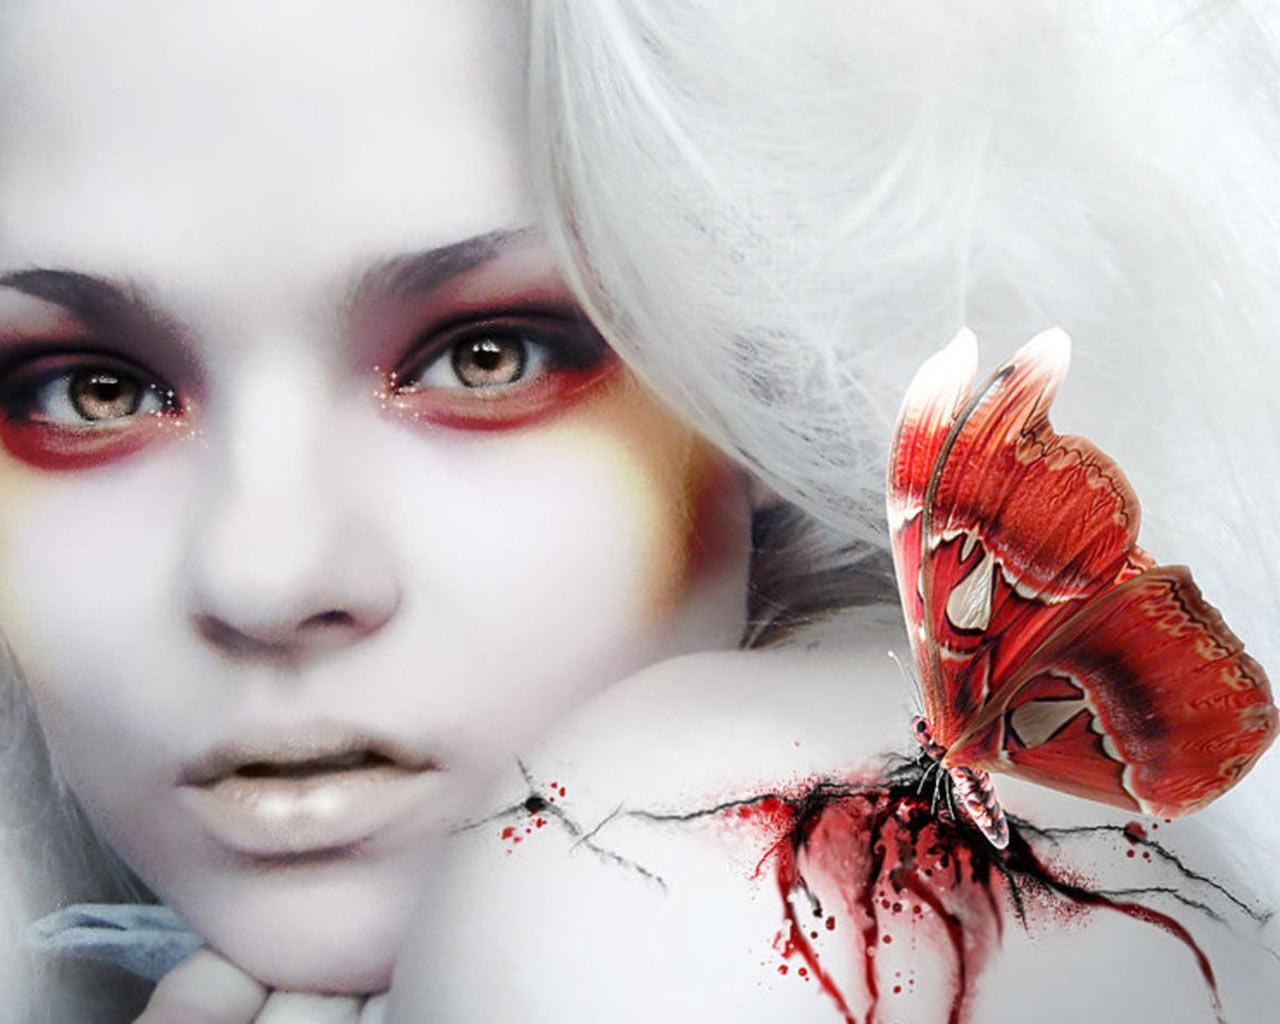 http://2.bp.blogspot.com/-vk--iIIv_S8/Th7yxjnZ_8I/AAAAAAAABDE/Tj3-K0HtfYY/s1600/Vampire_Weekend.jpg